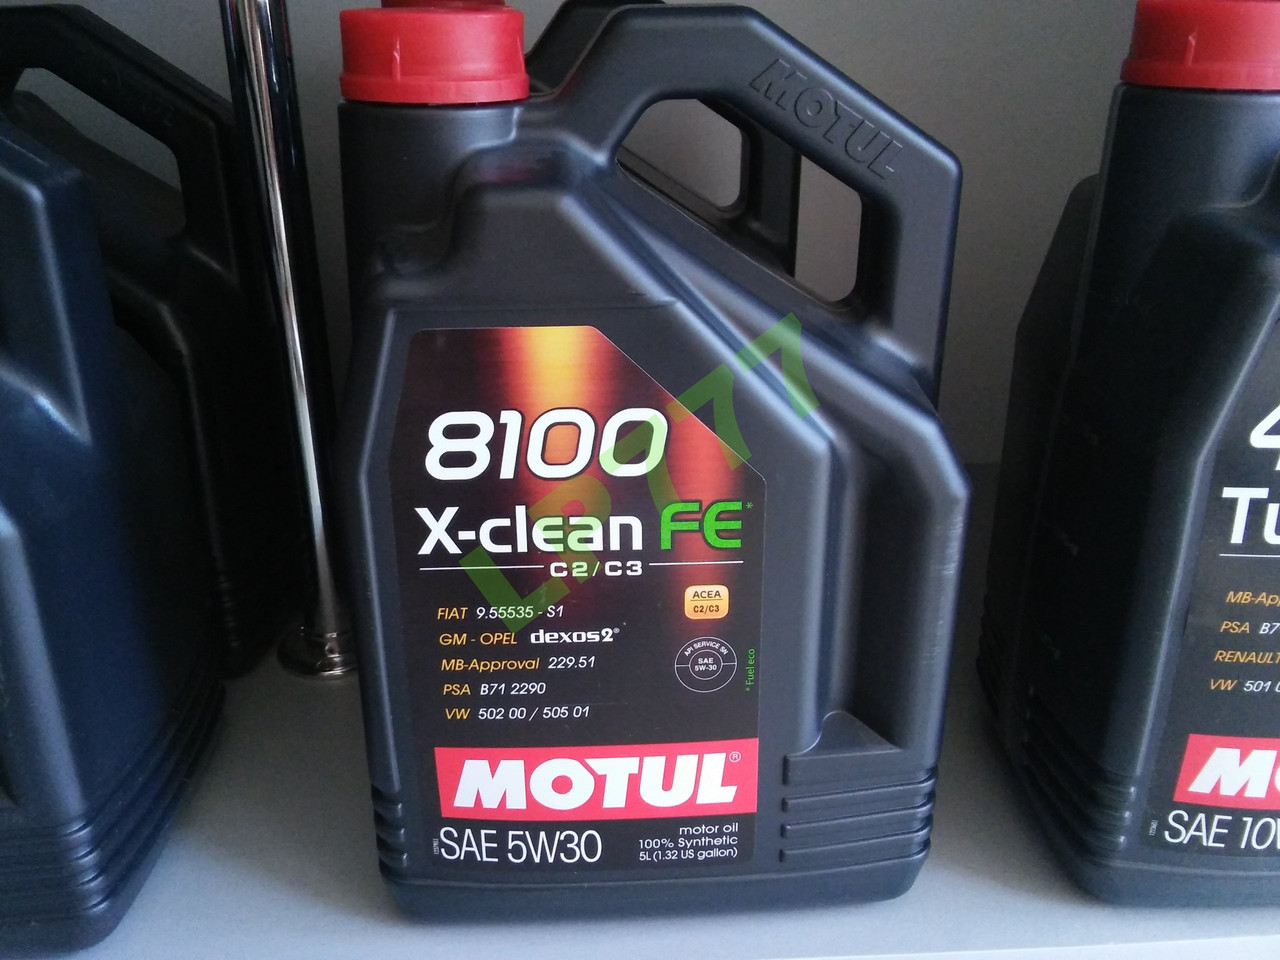 Motul 8100 X-clean FE 5W30 5л.